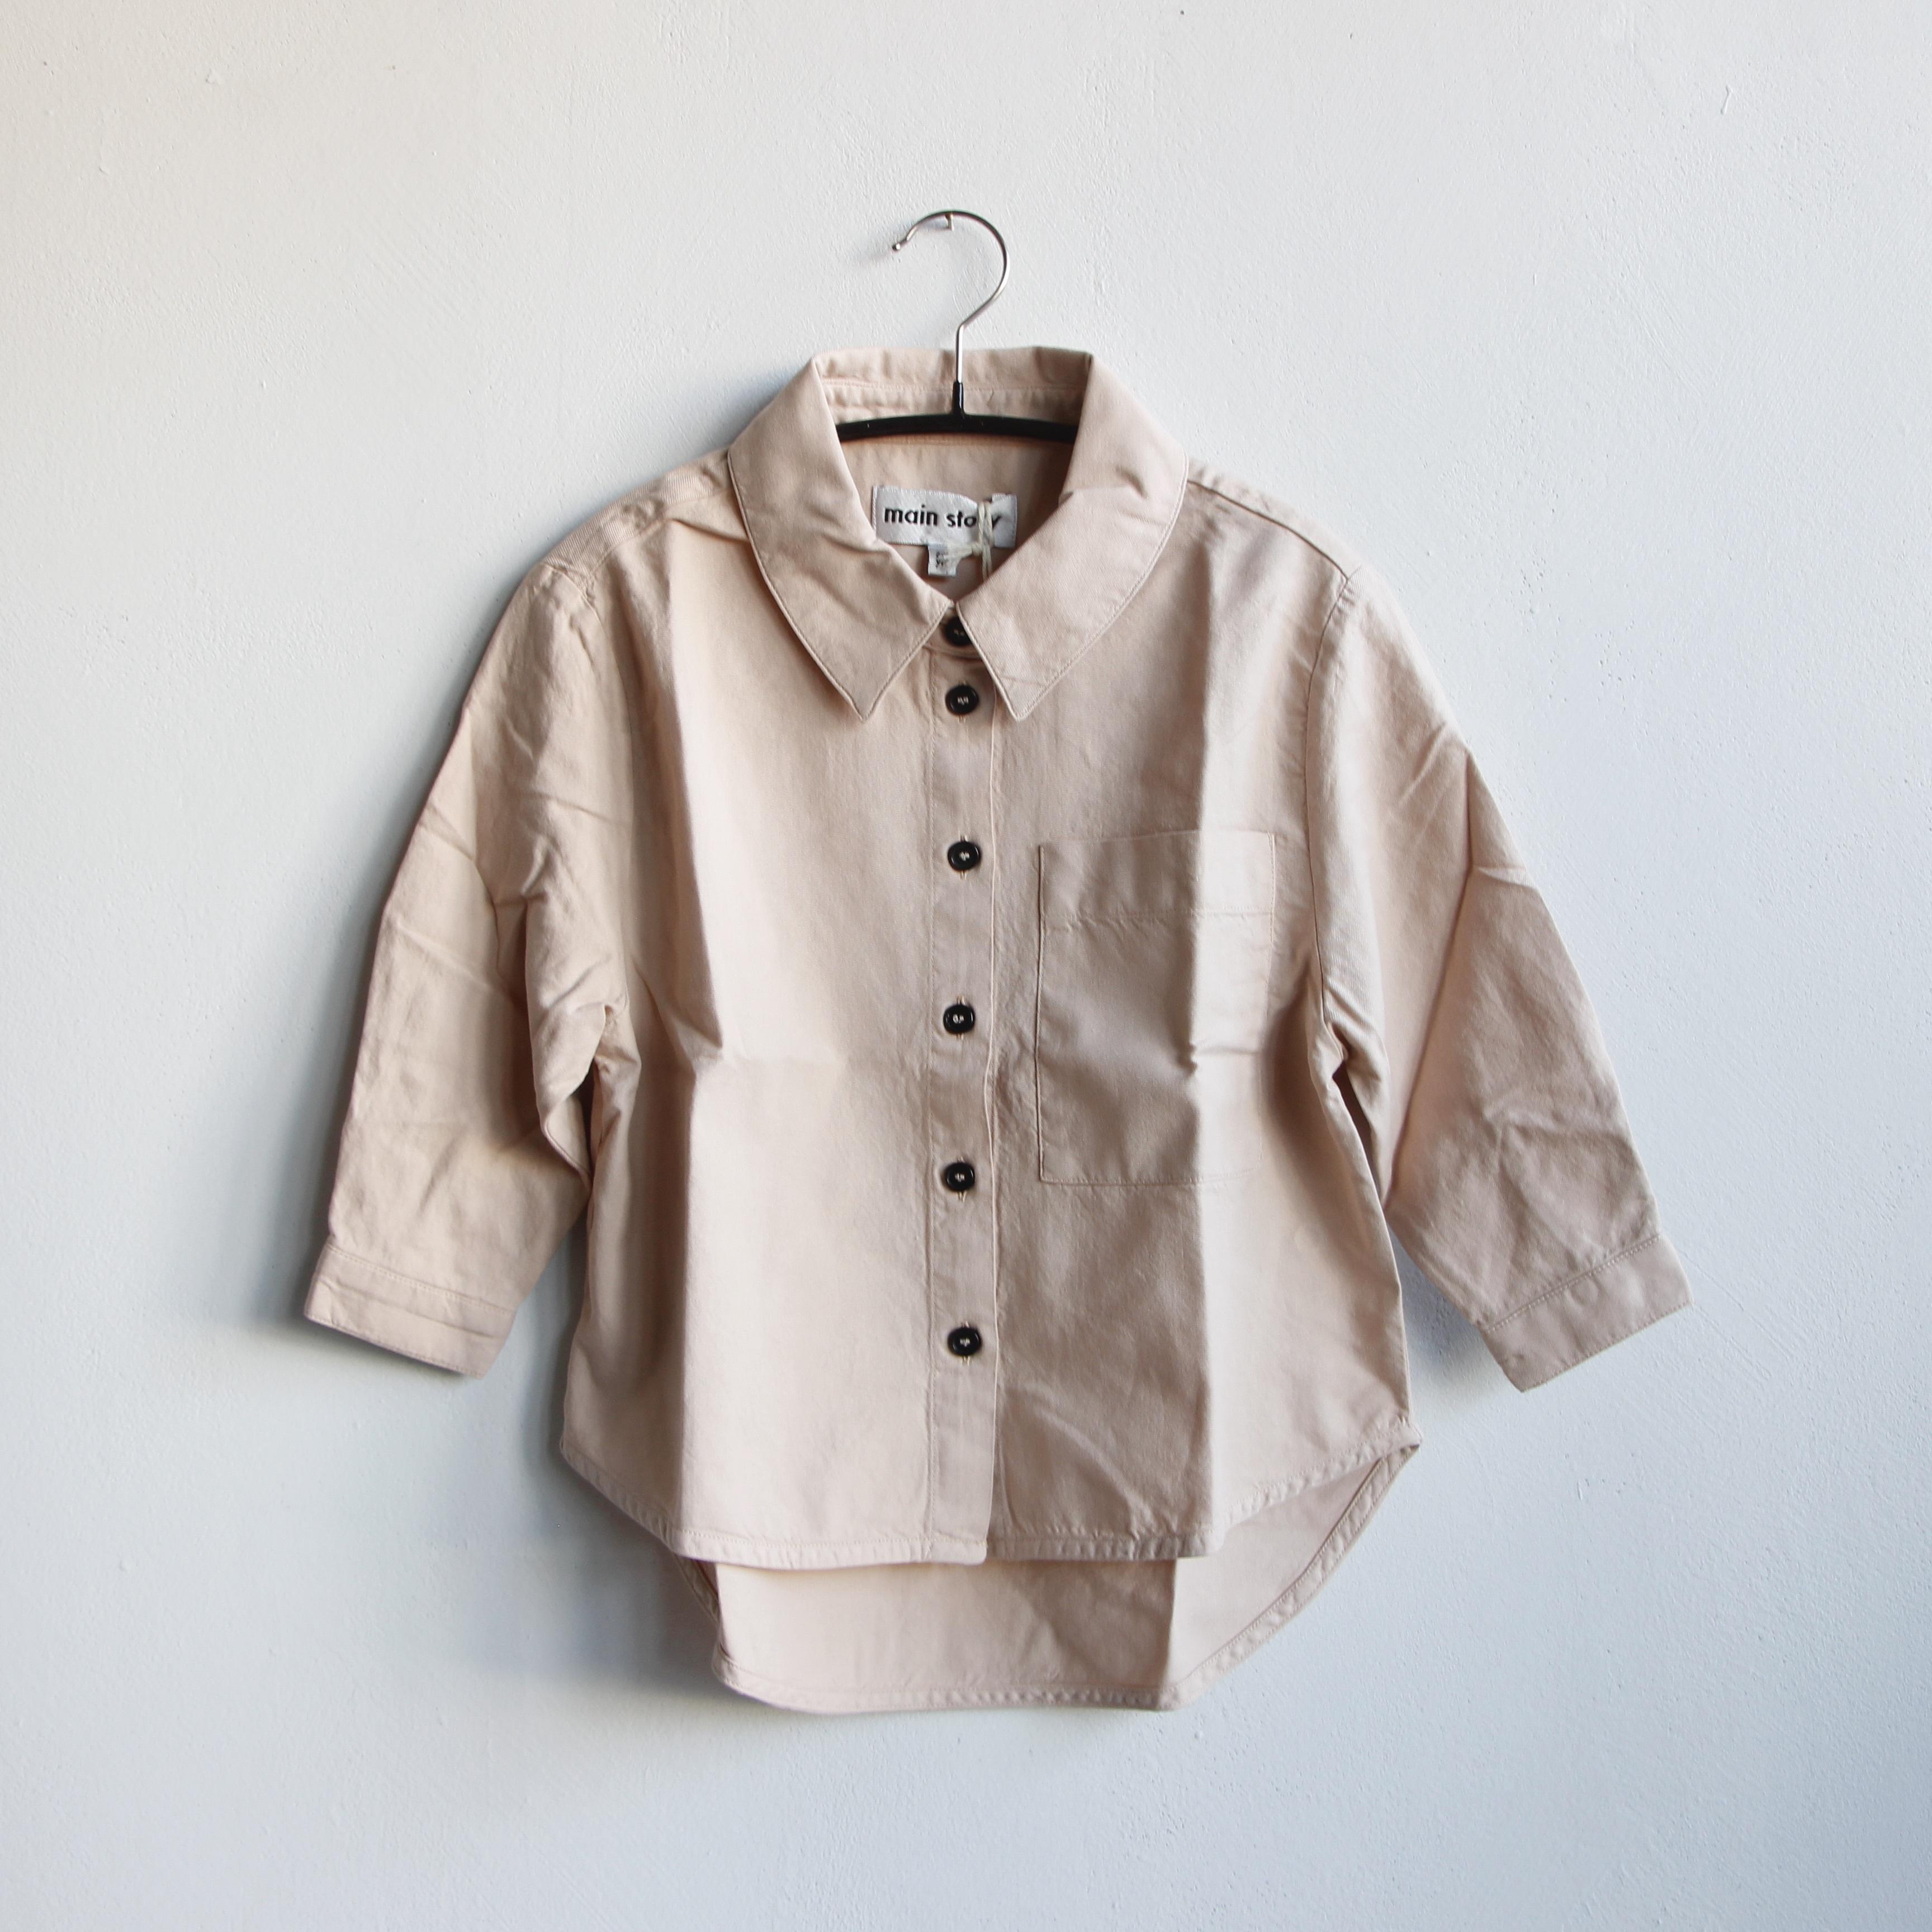 《main story 2021SS》Laundered Shirt / Smoke Grey